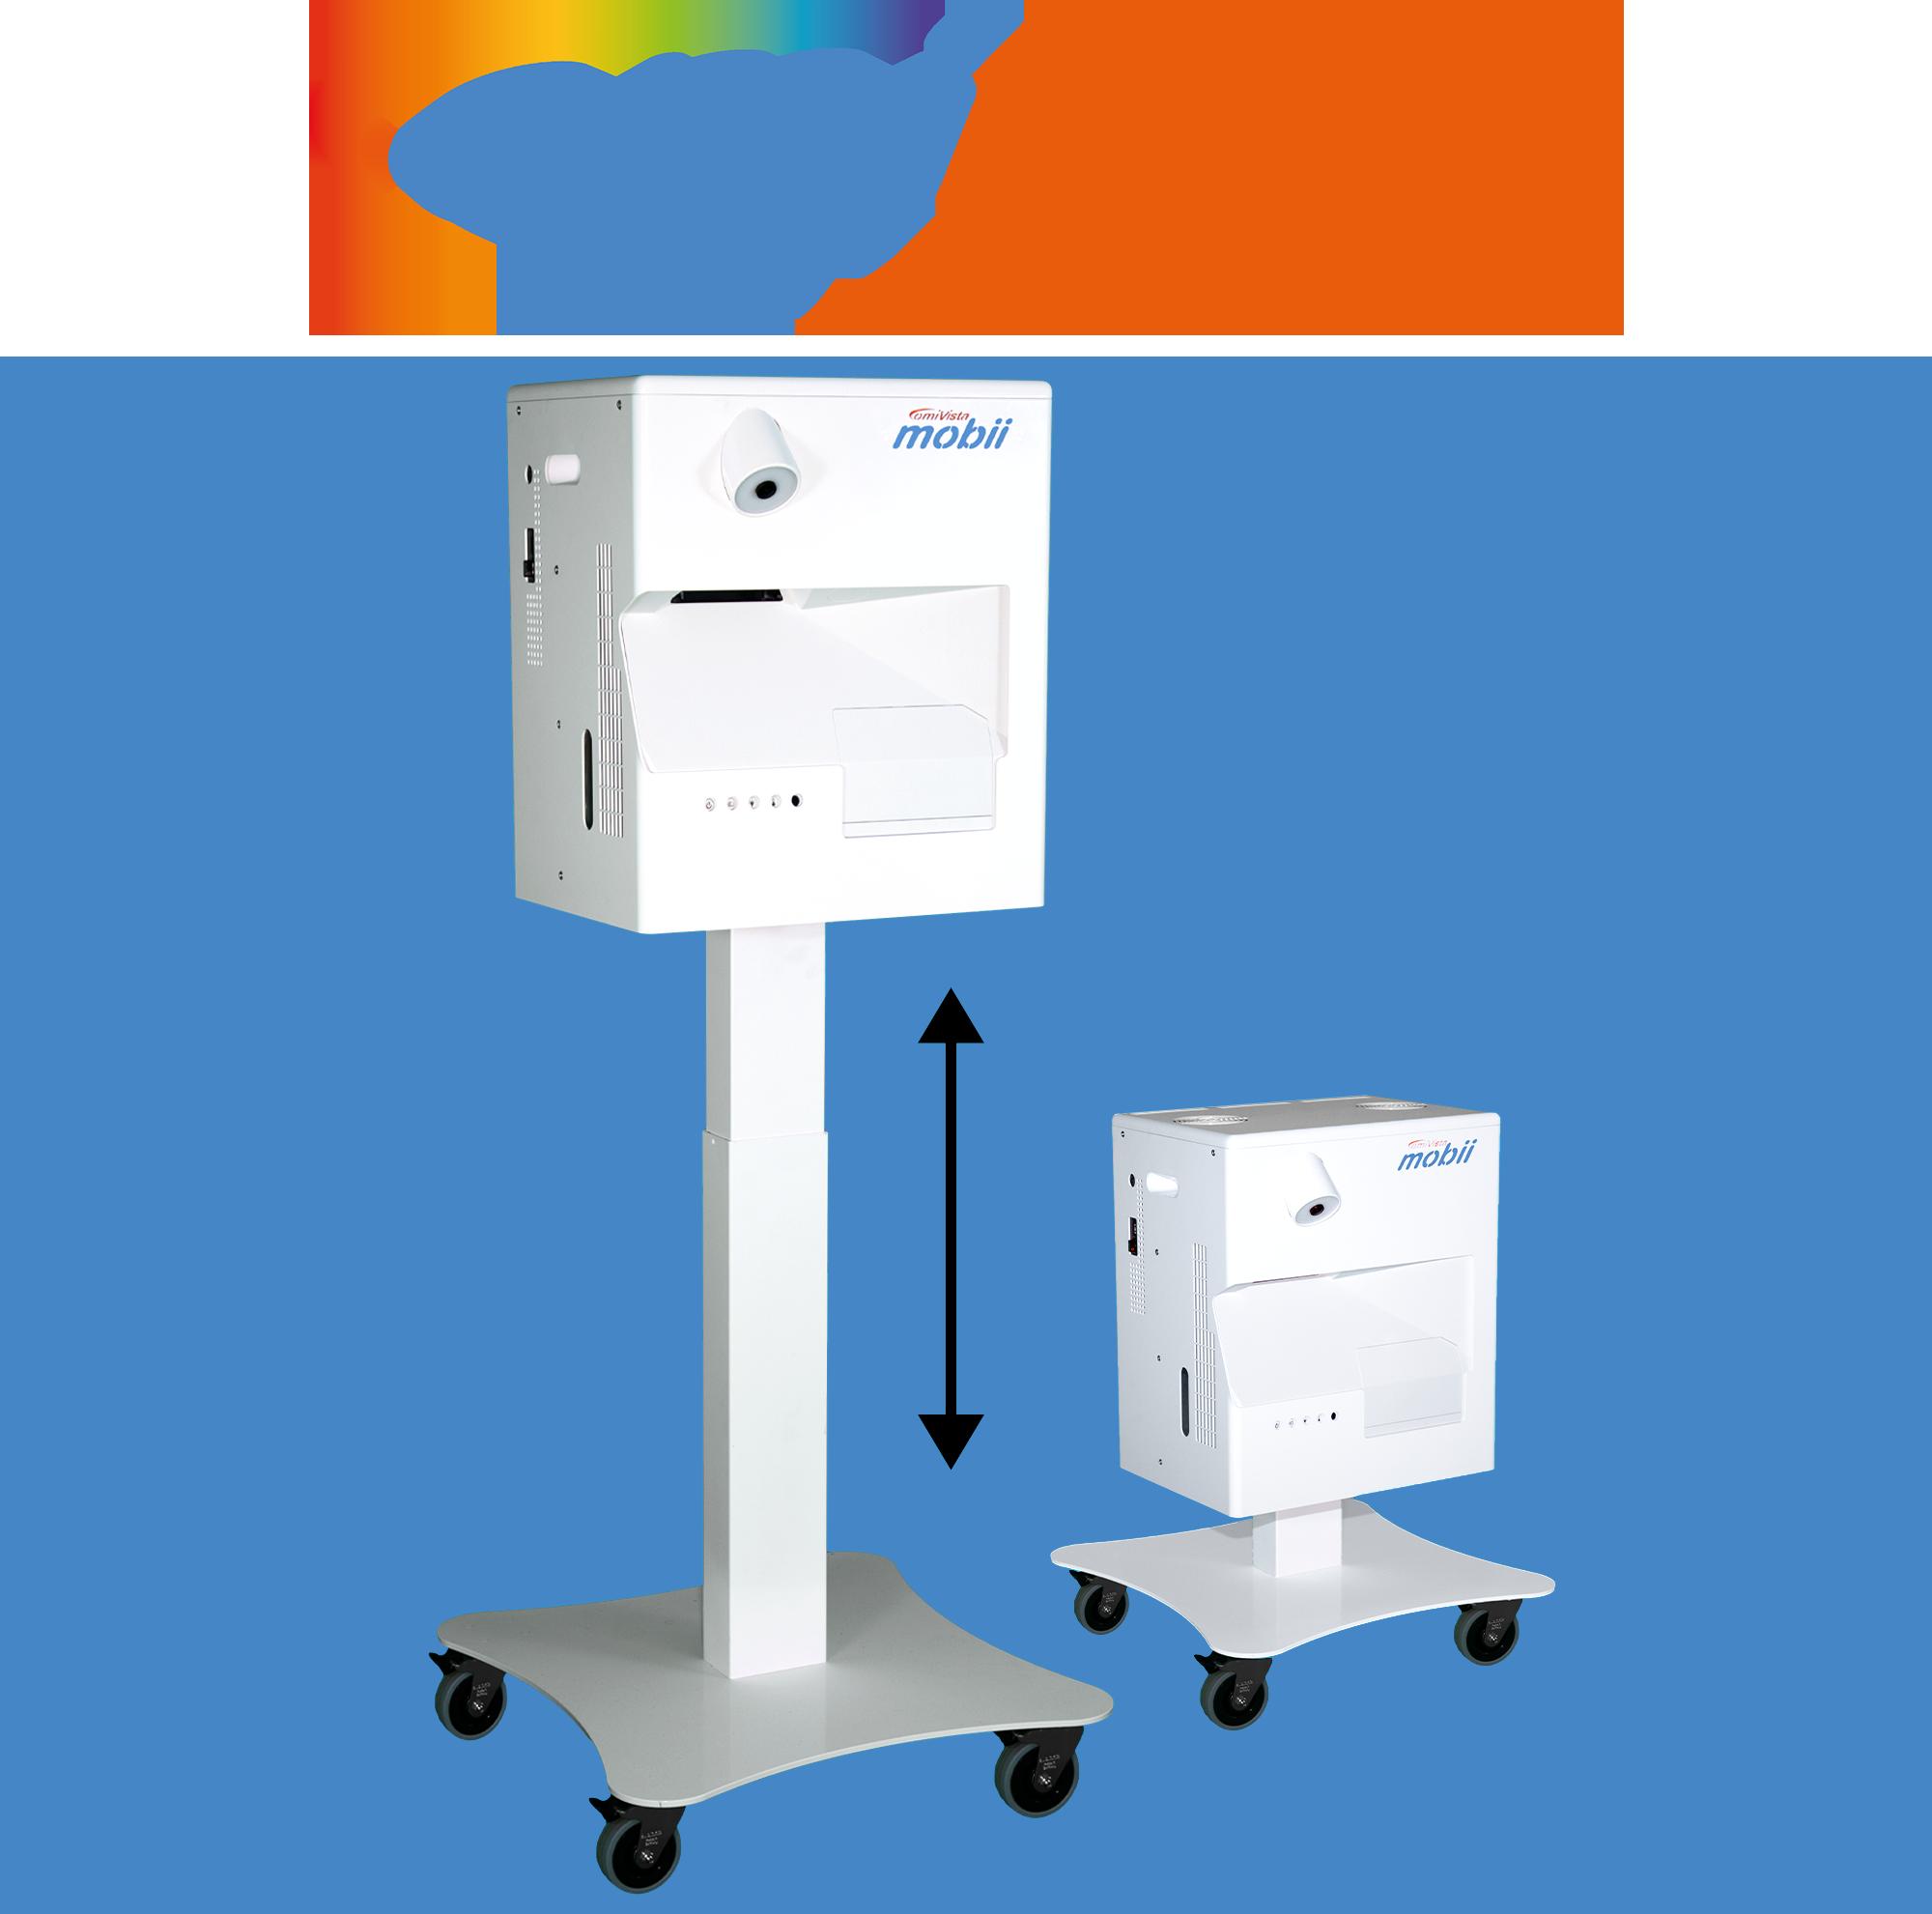 Easily height adjustable portable Mobii sensory projector